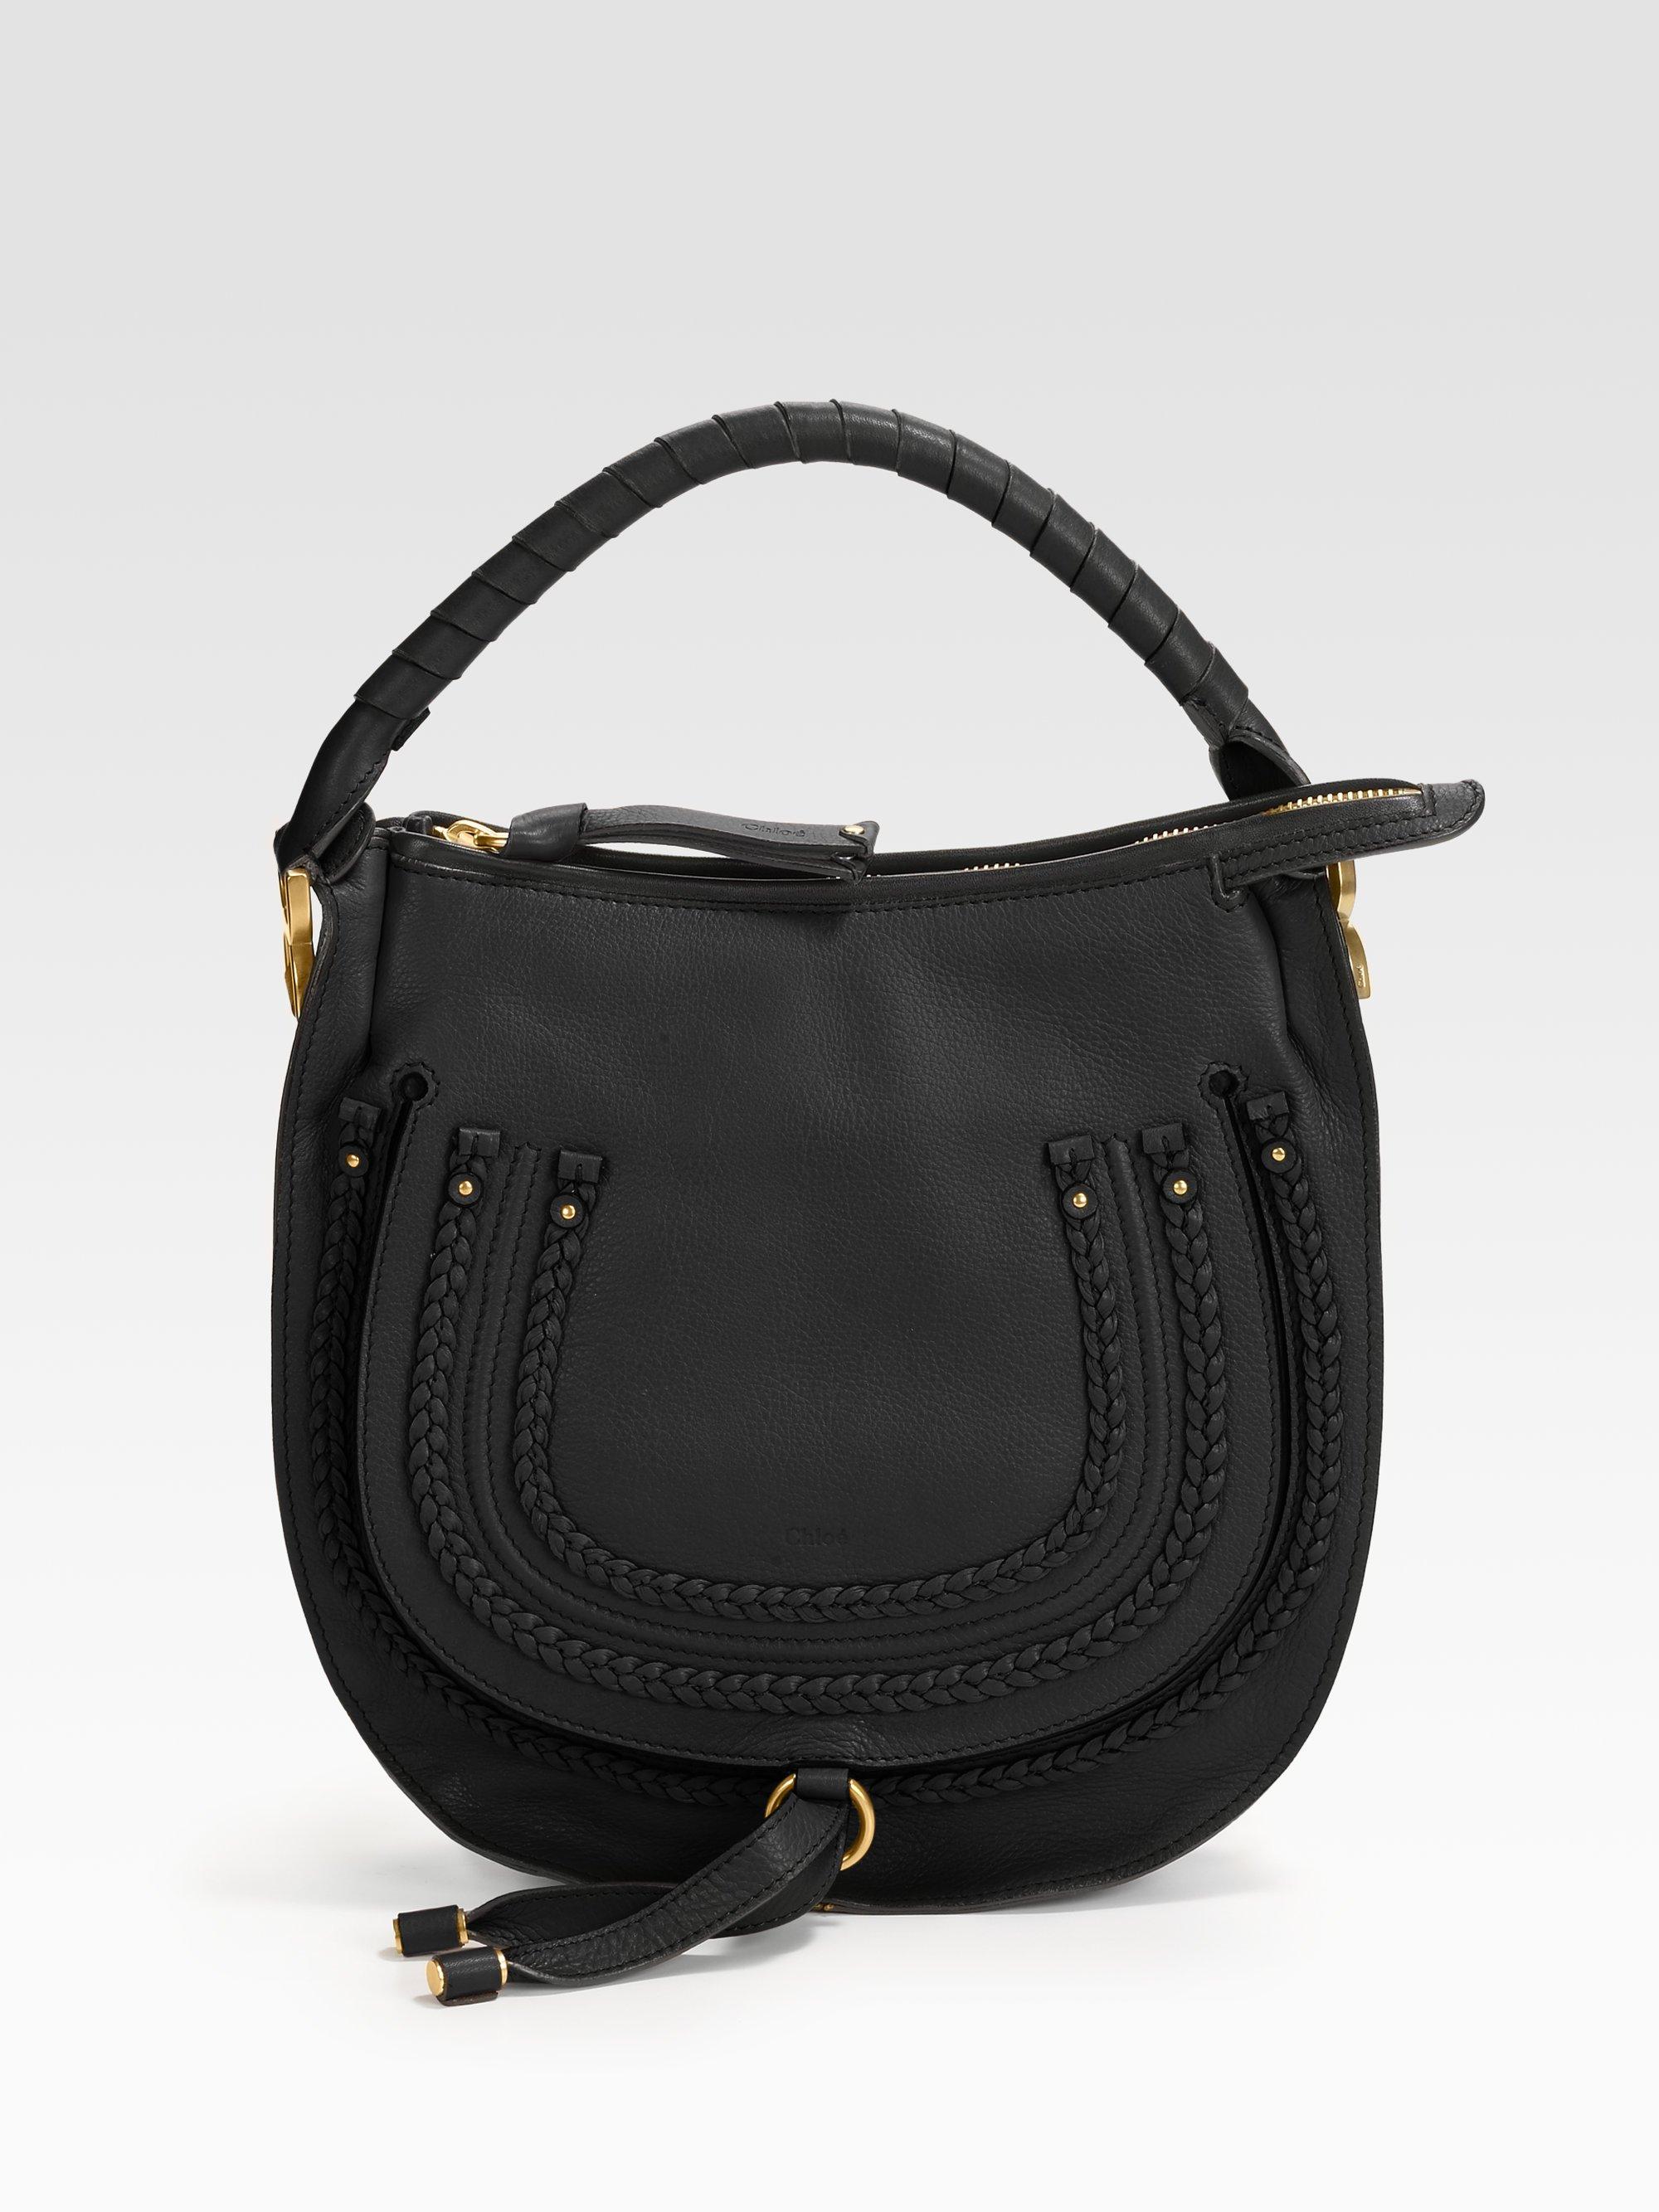 Lyst - Chloé Marcie Small Braided Hobo in Black 6457842058